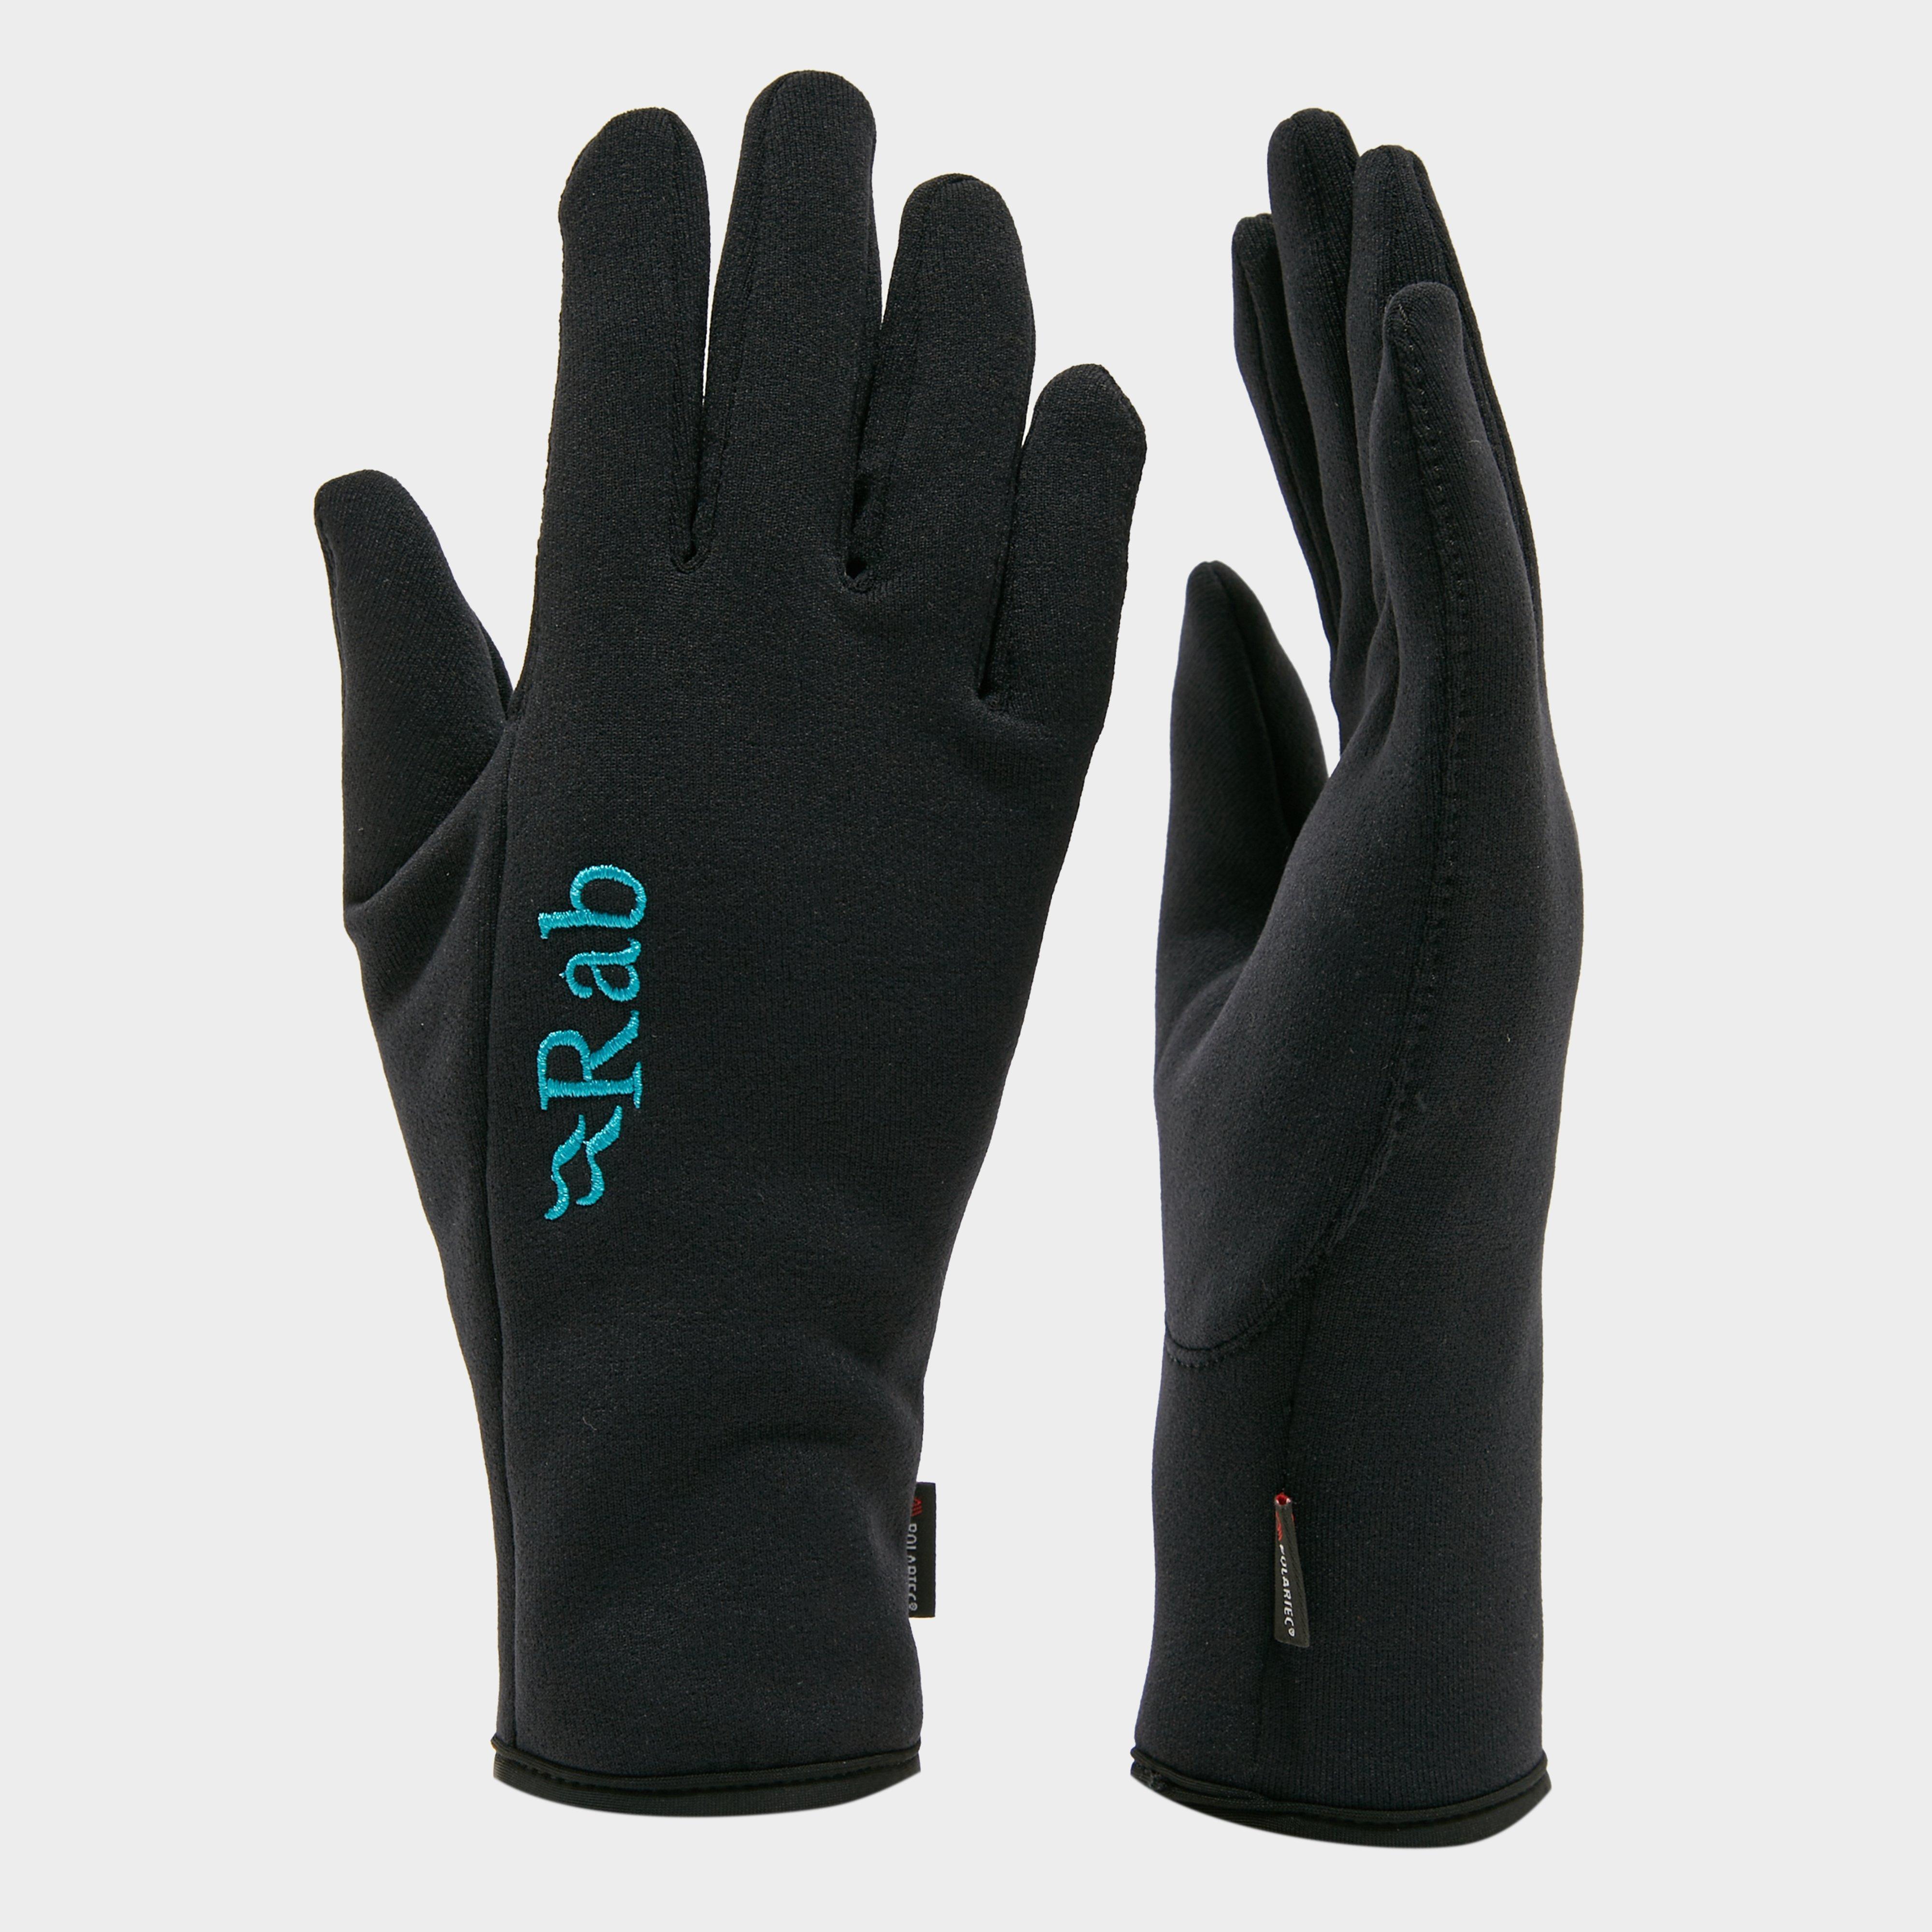 Rab Rab Powerstretch Womens Glove - N/A, N/A